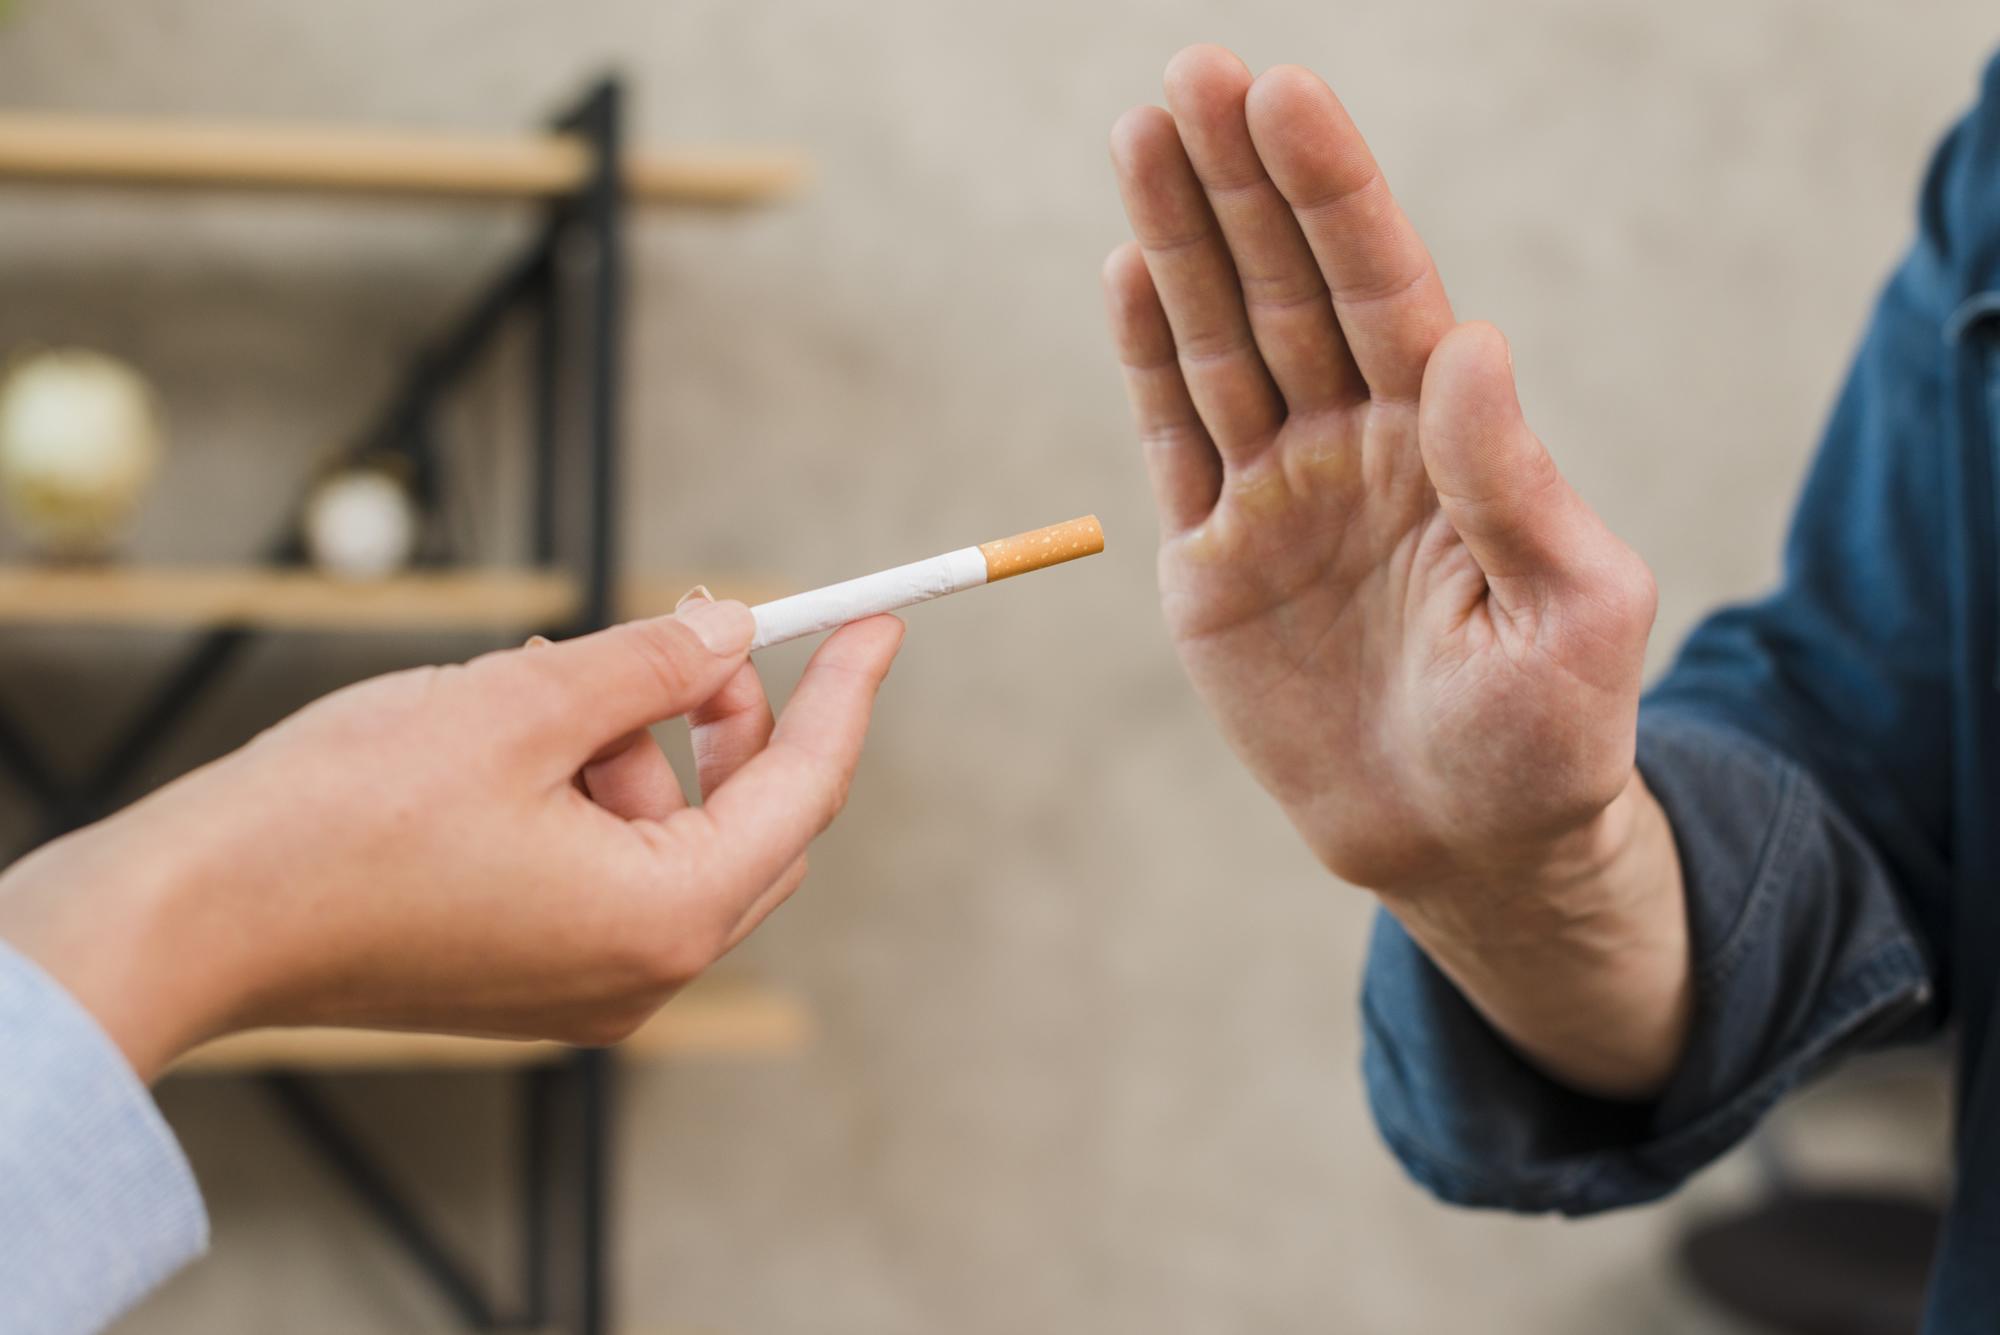 tabagismo - cigarro